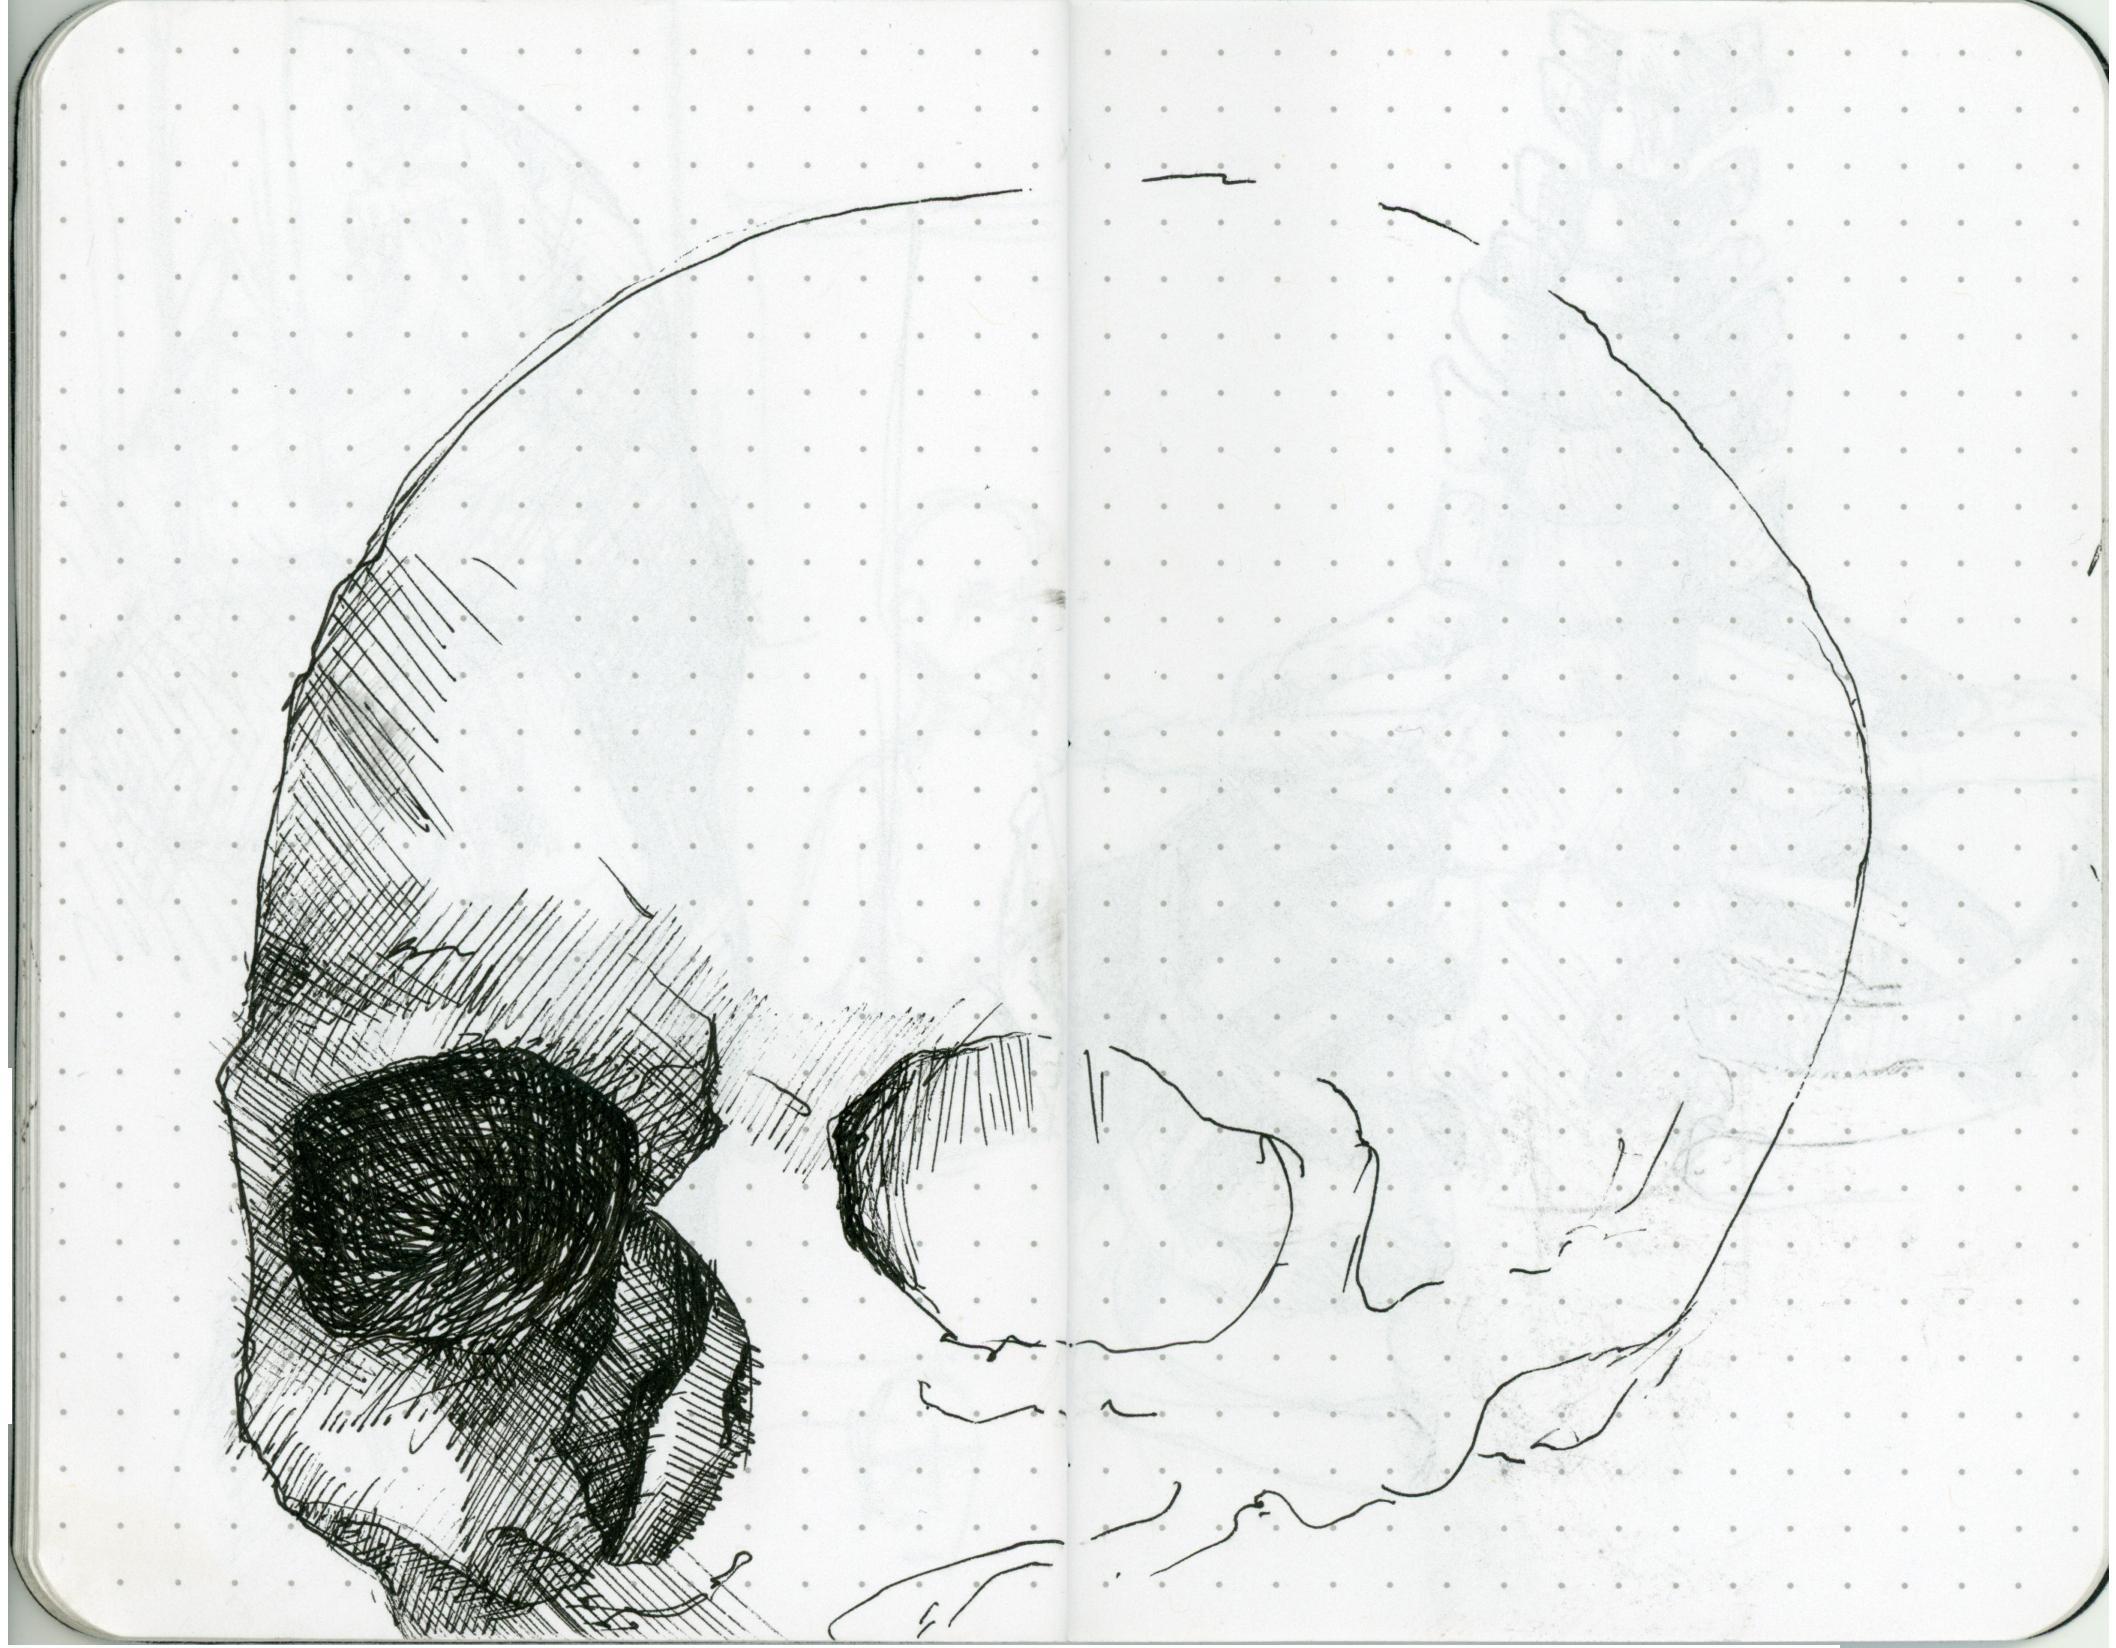 Sketchbook_021_0005_Layer-10.png